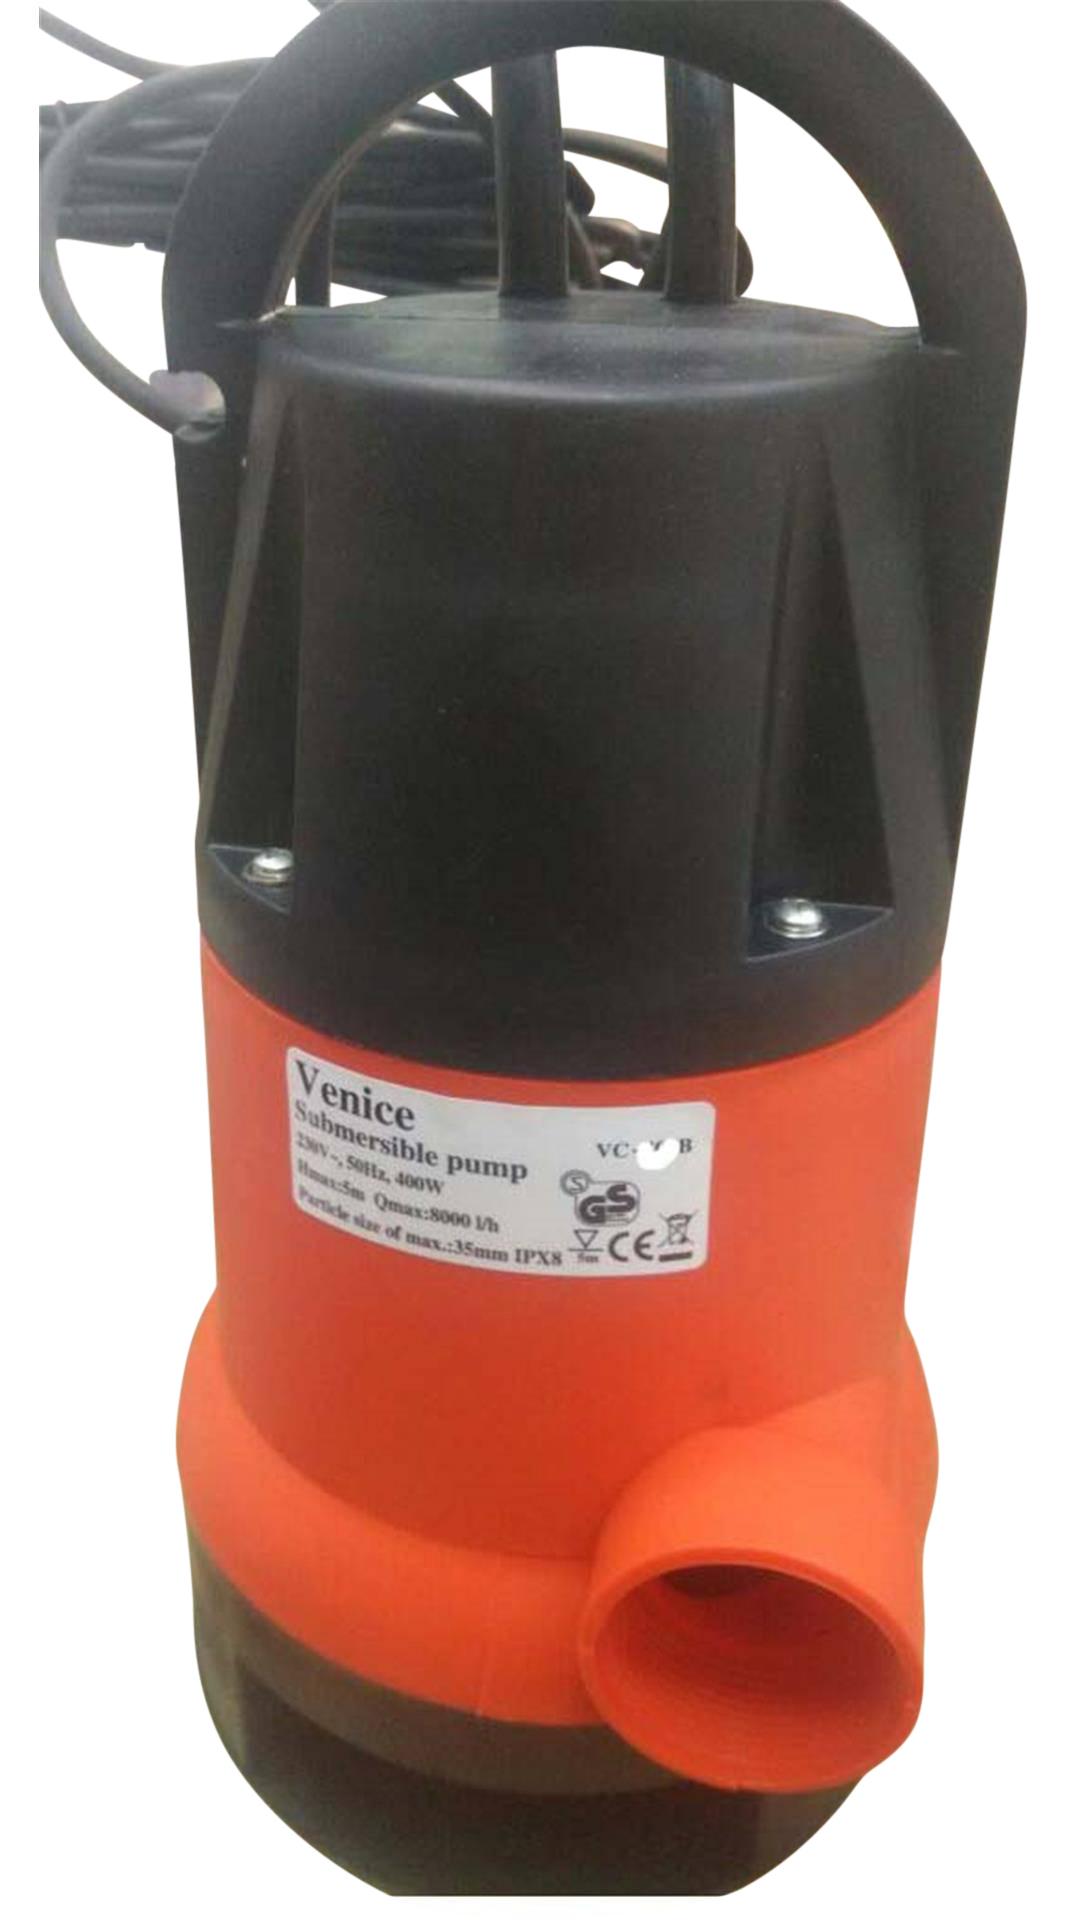 Venice Sewage Submersible Pump VC-750 (1 HP)